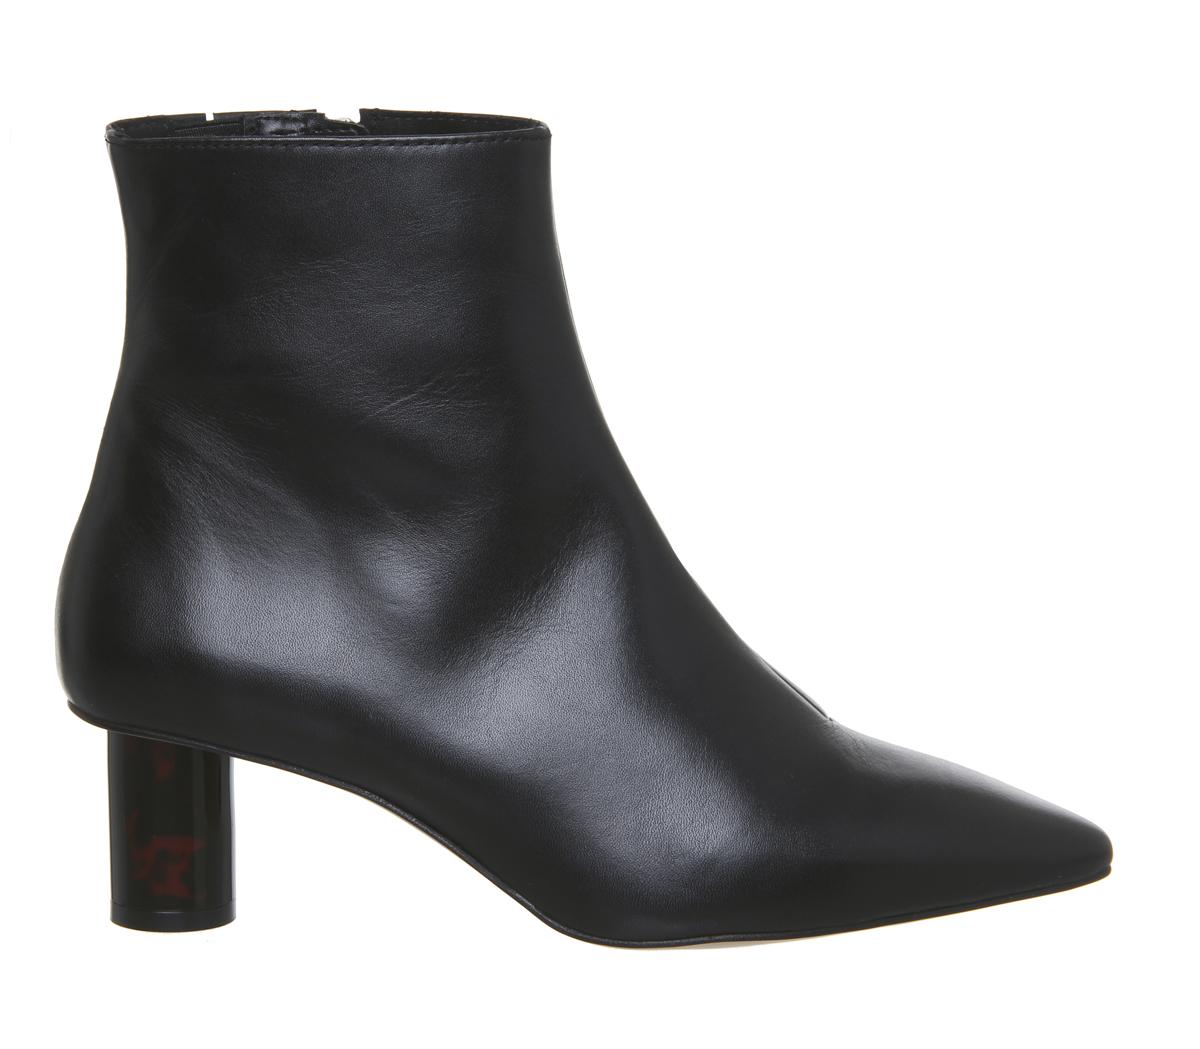 Womens Office Afflict Cylindrical Heel Boots Black Leather Tortoiseshell Heel Bo